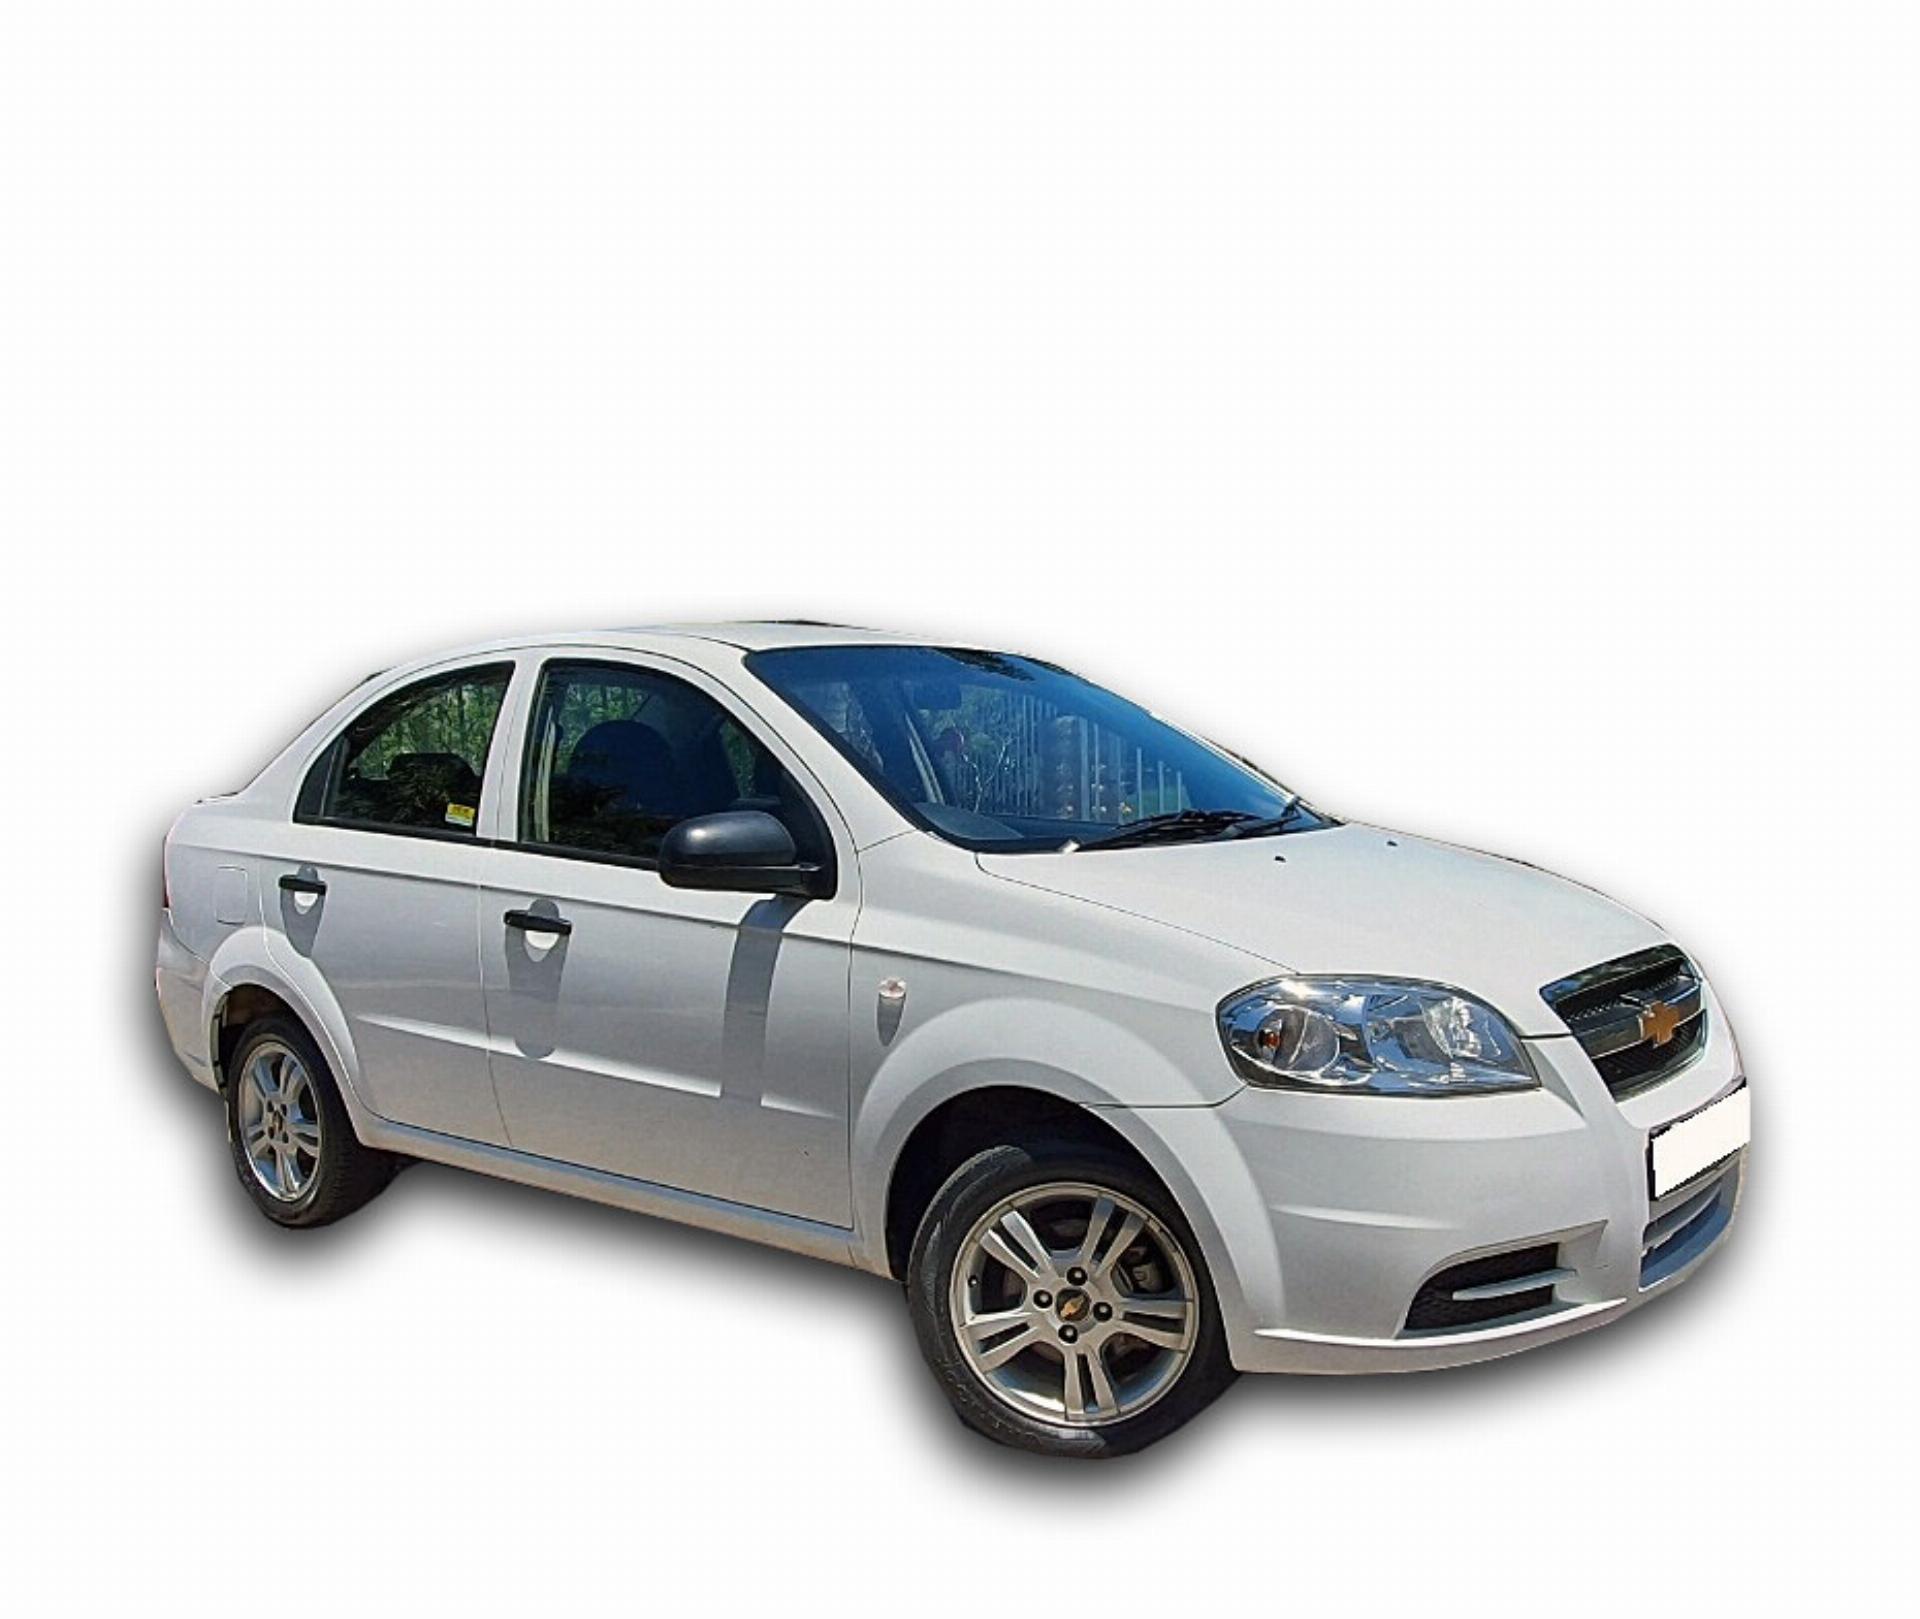 Chevrolet Aveo 1.6L Sedan